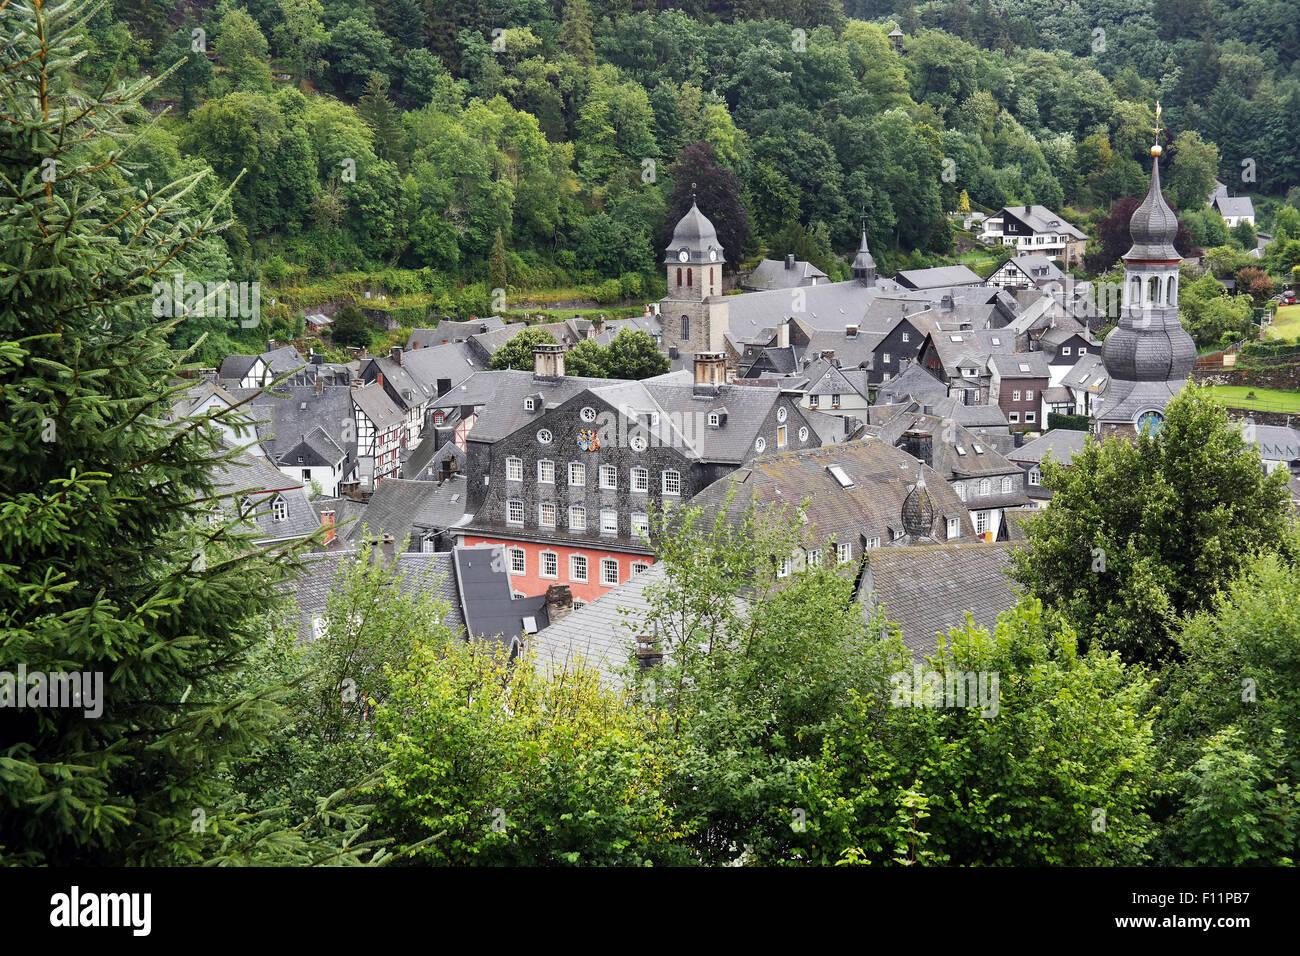 Slate-roofs of Monschau, Eifel region, North Rhine-Westphalia, Germany. - Stock Image